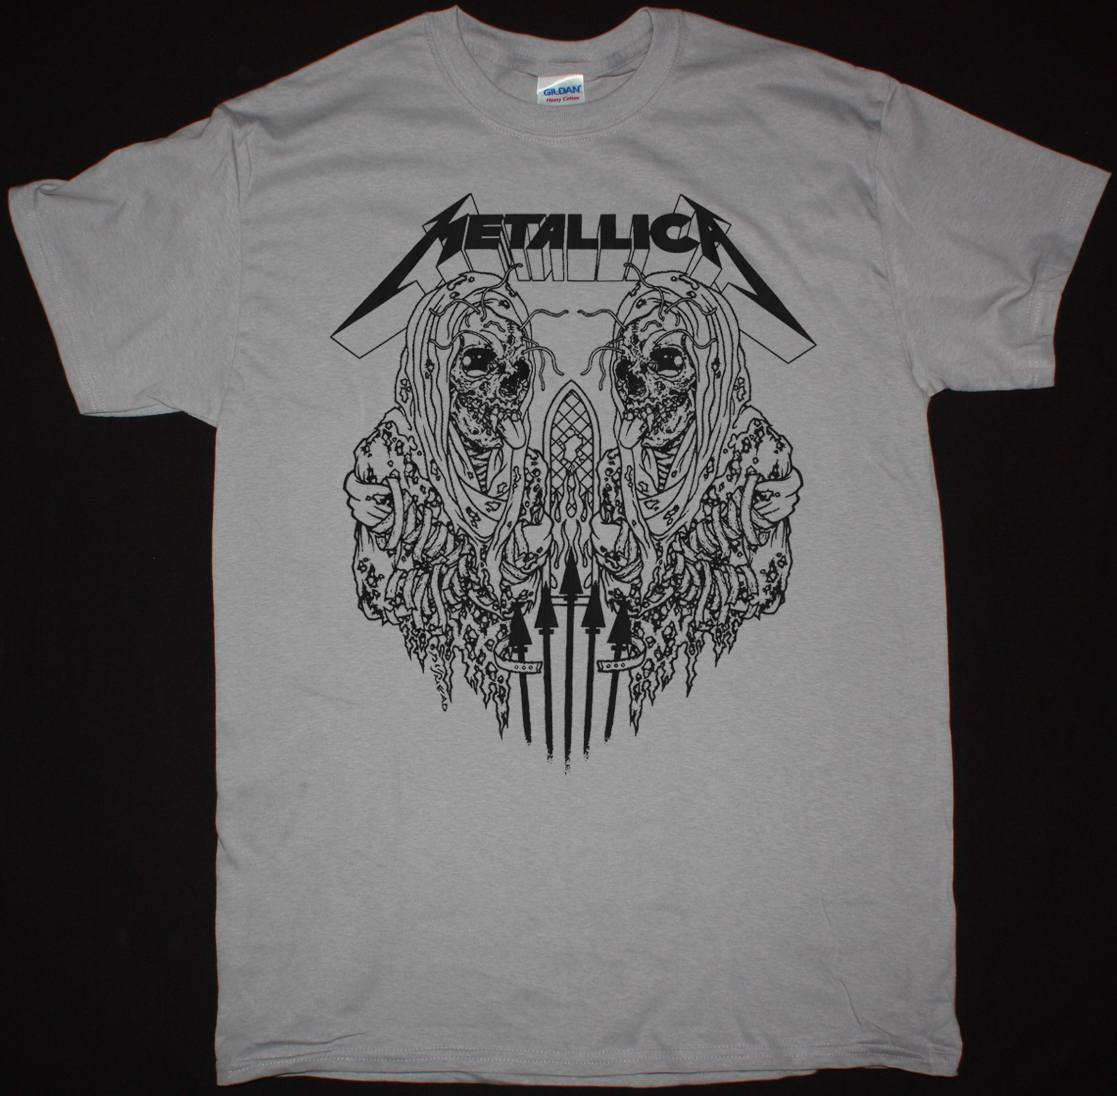 Metallica Madly In Anger With The World New Black T Shirt Kaos Band Artic Monkeys Gildan Artwor Pushead Silver Light Grey